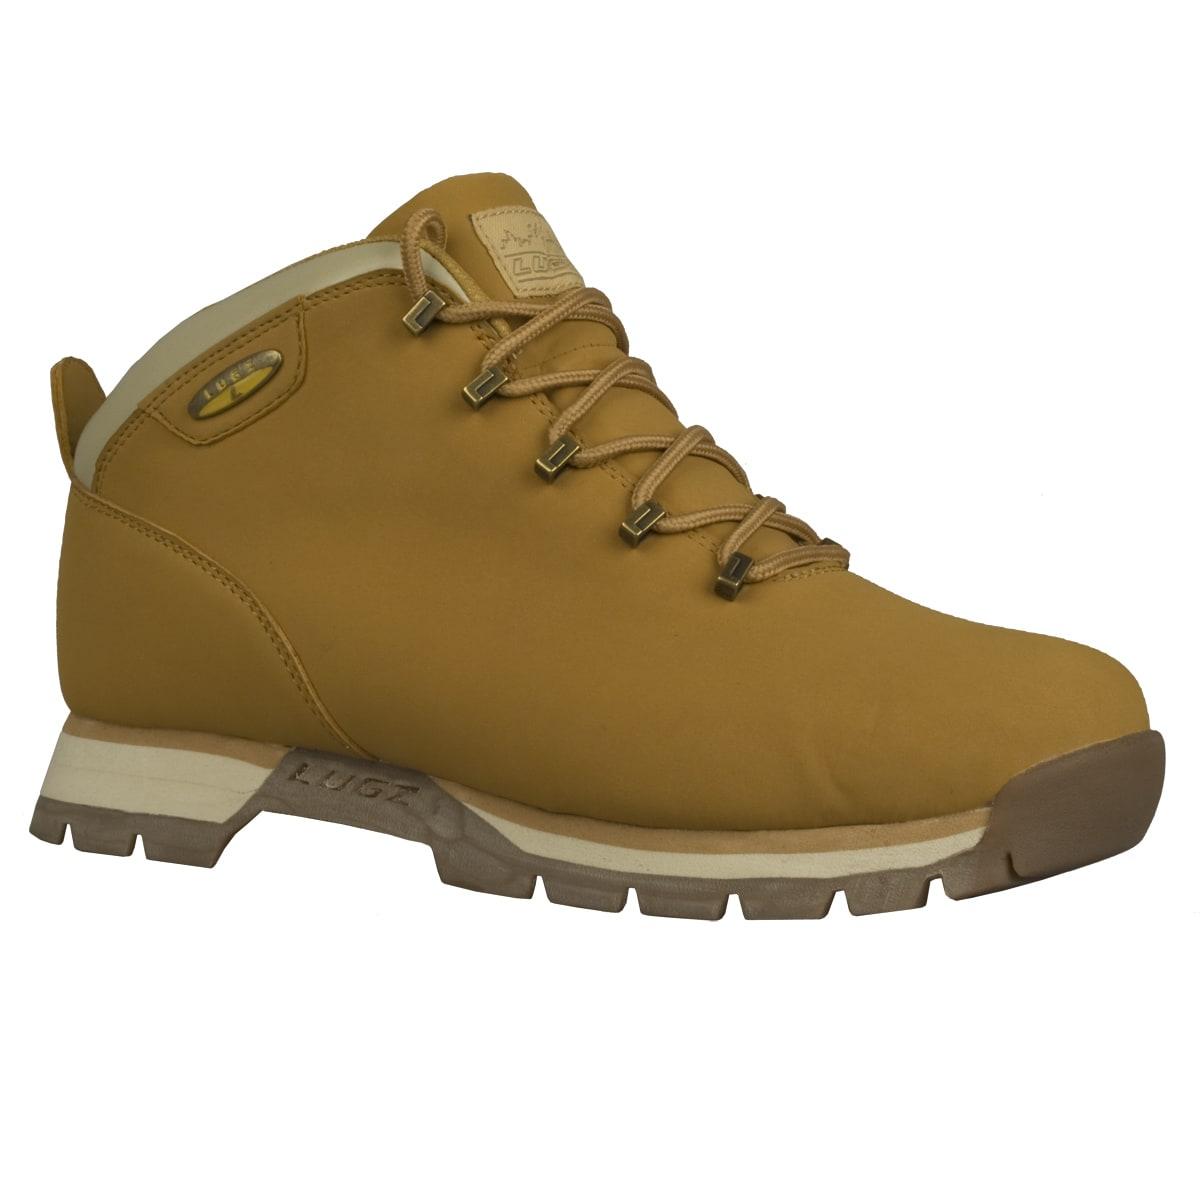 Lugz Men's wheat 'Jam II' Short Boots